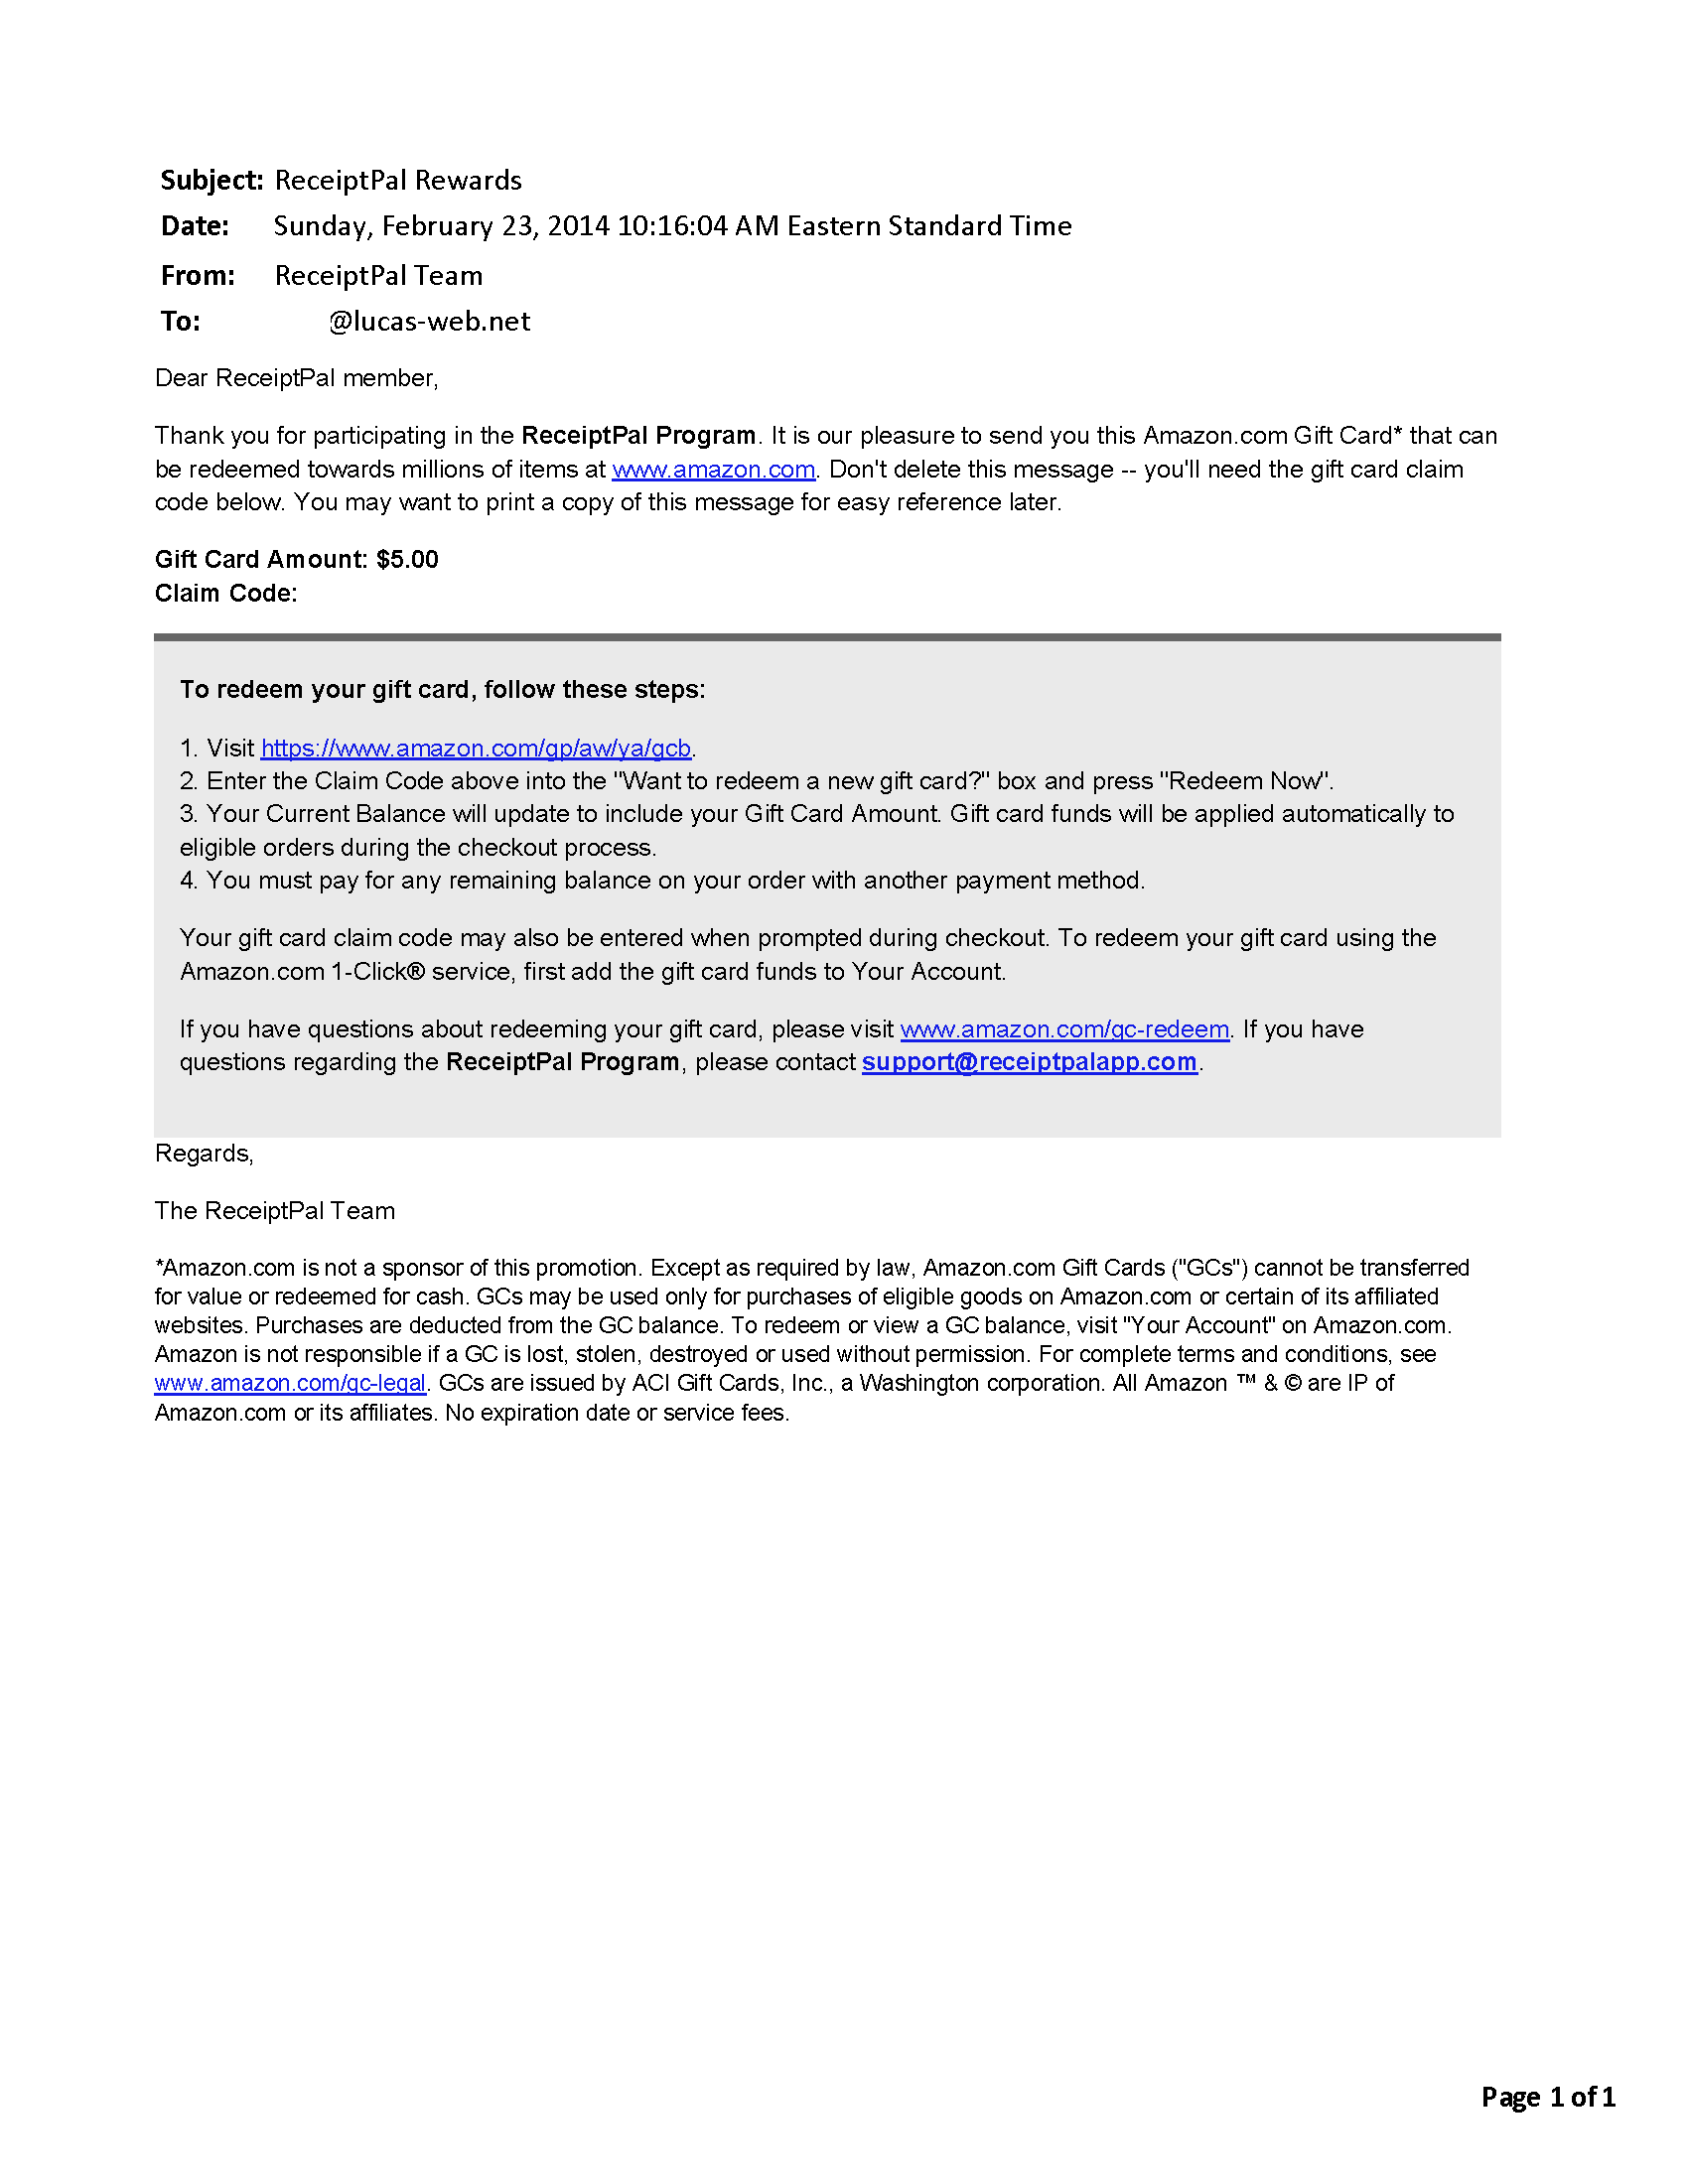 $5.00 - ReceiptPal - February 23, 2014